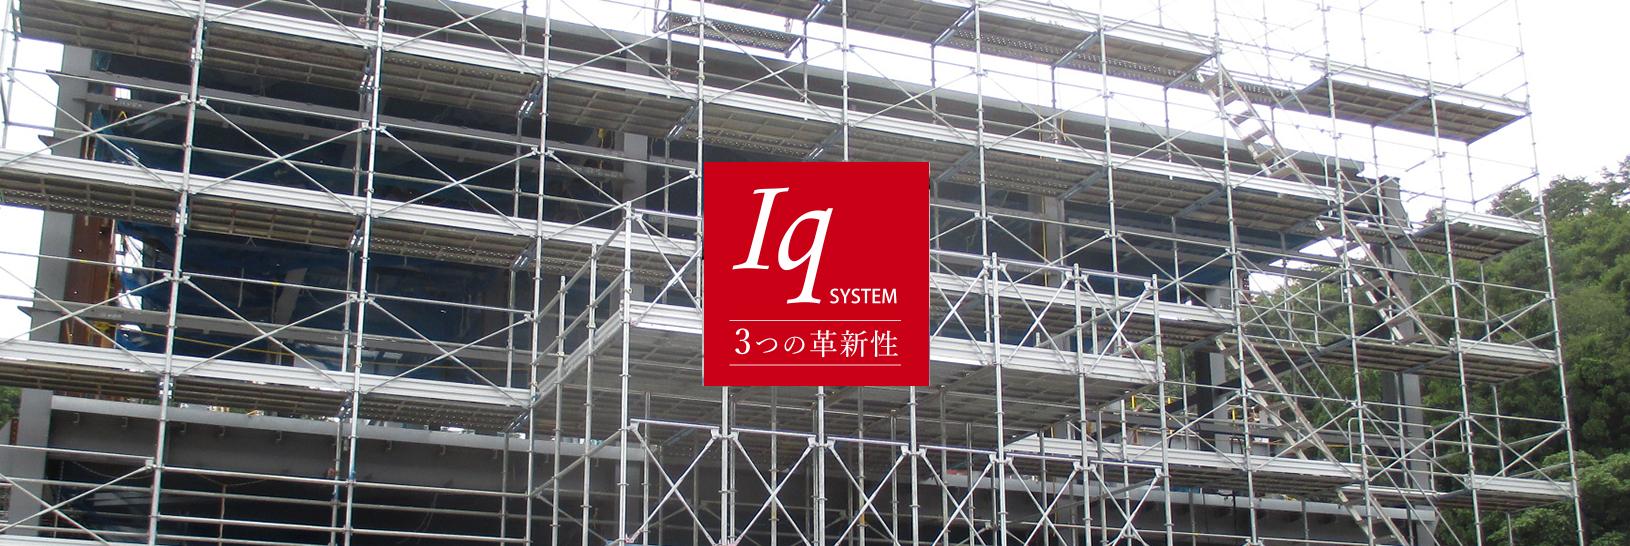 Iqシステム 3つの革新性